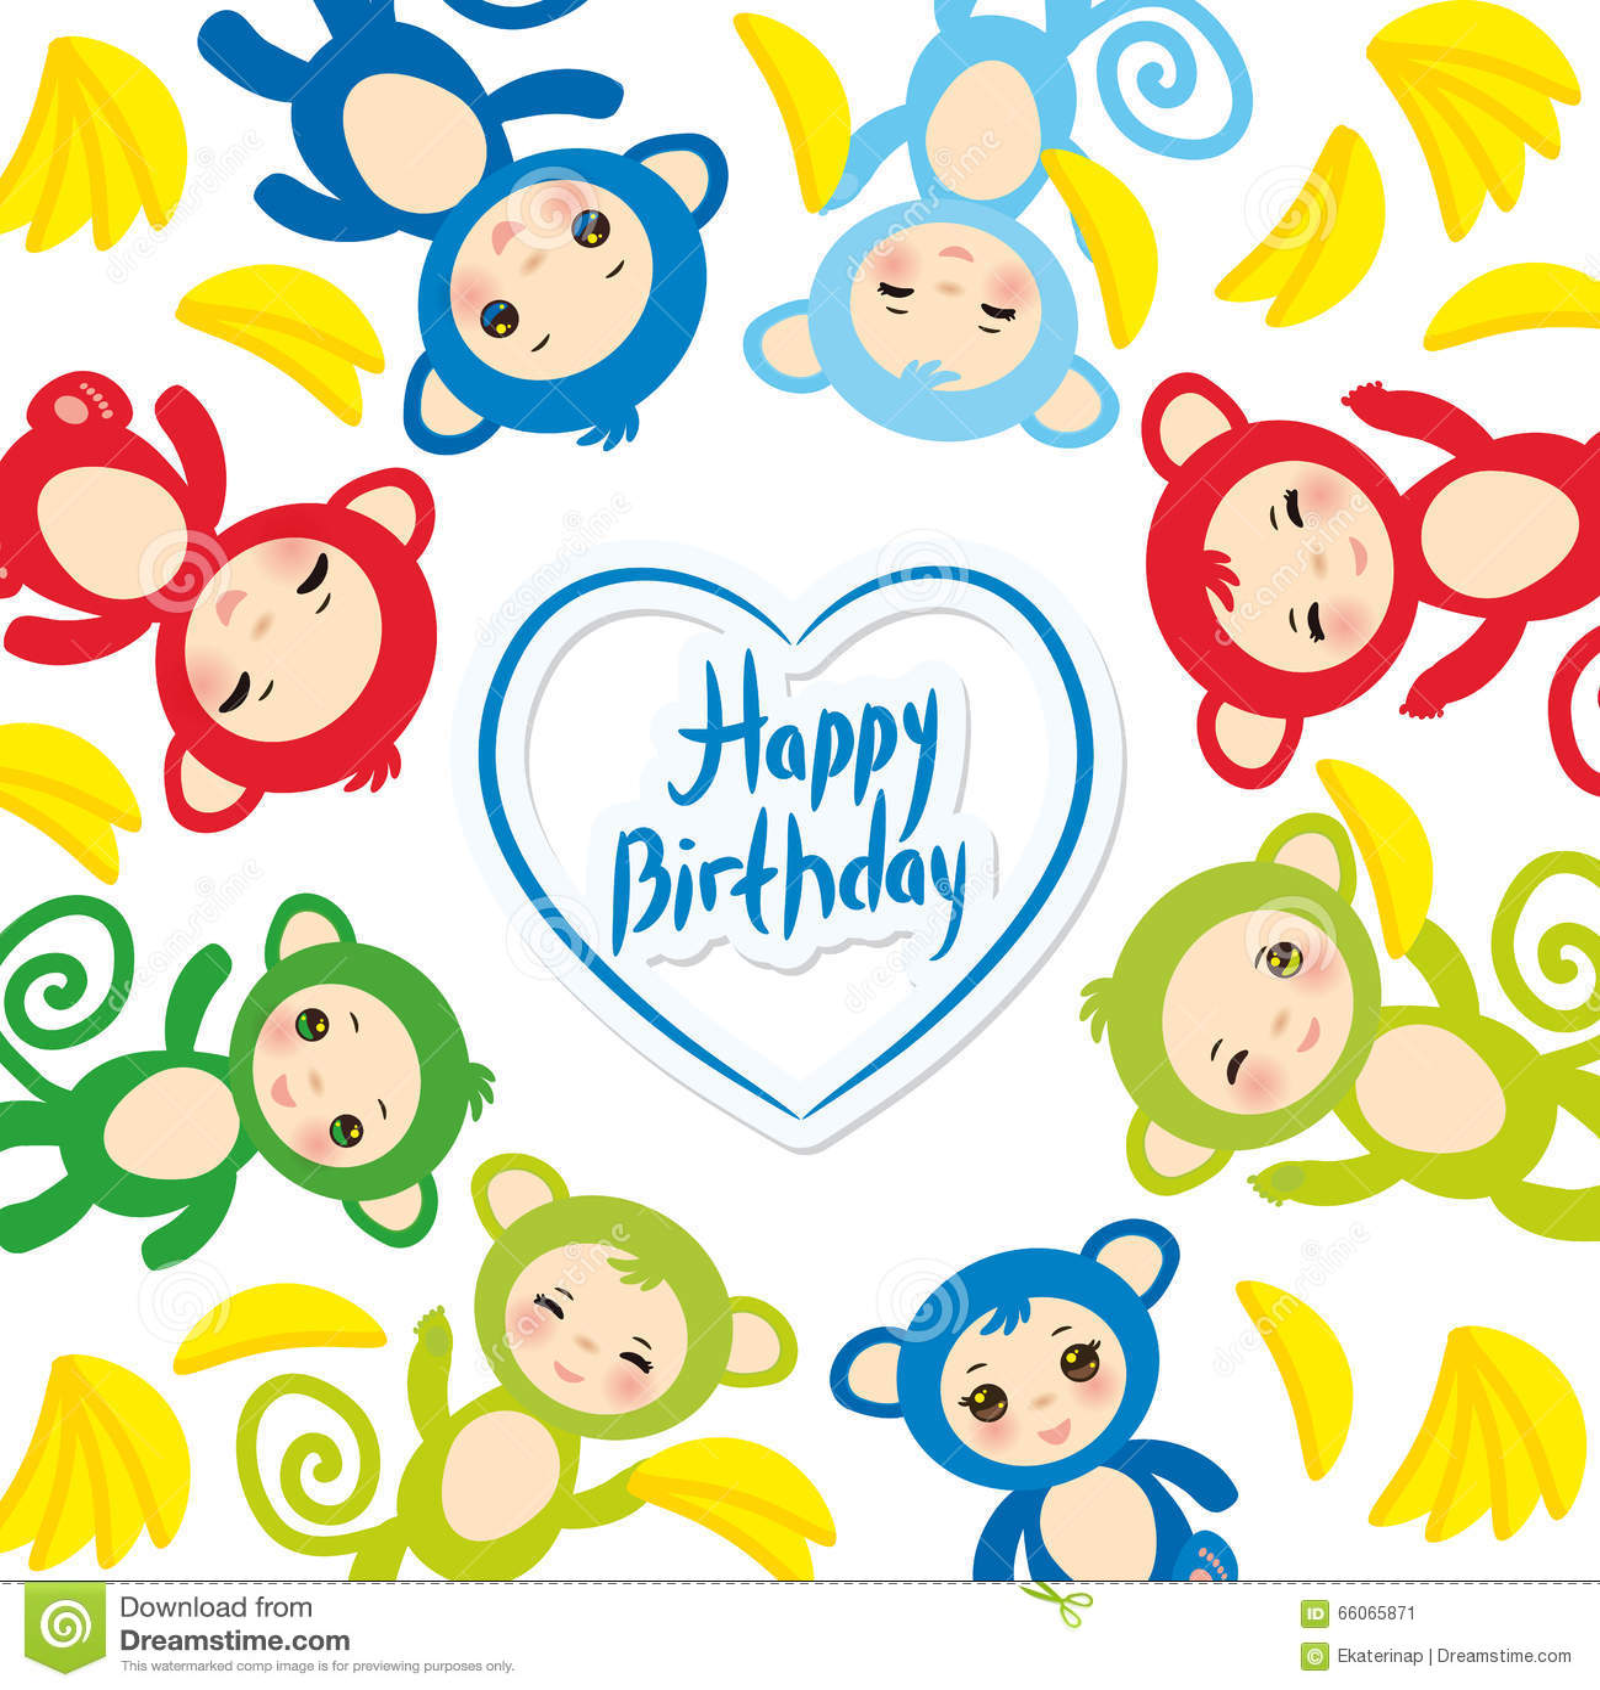 Happy Birthday Card Template Funny Green Blue Pink Orange Monkey Yellow Bananas Boys